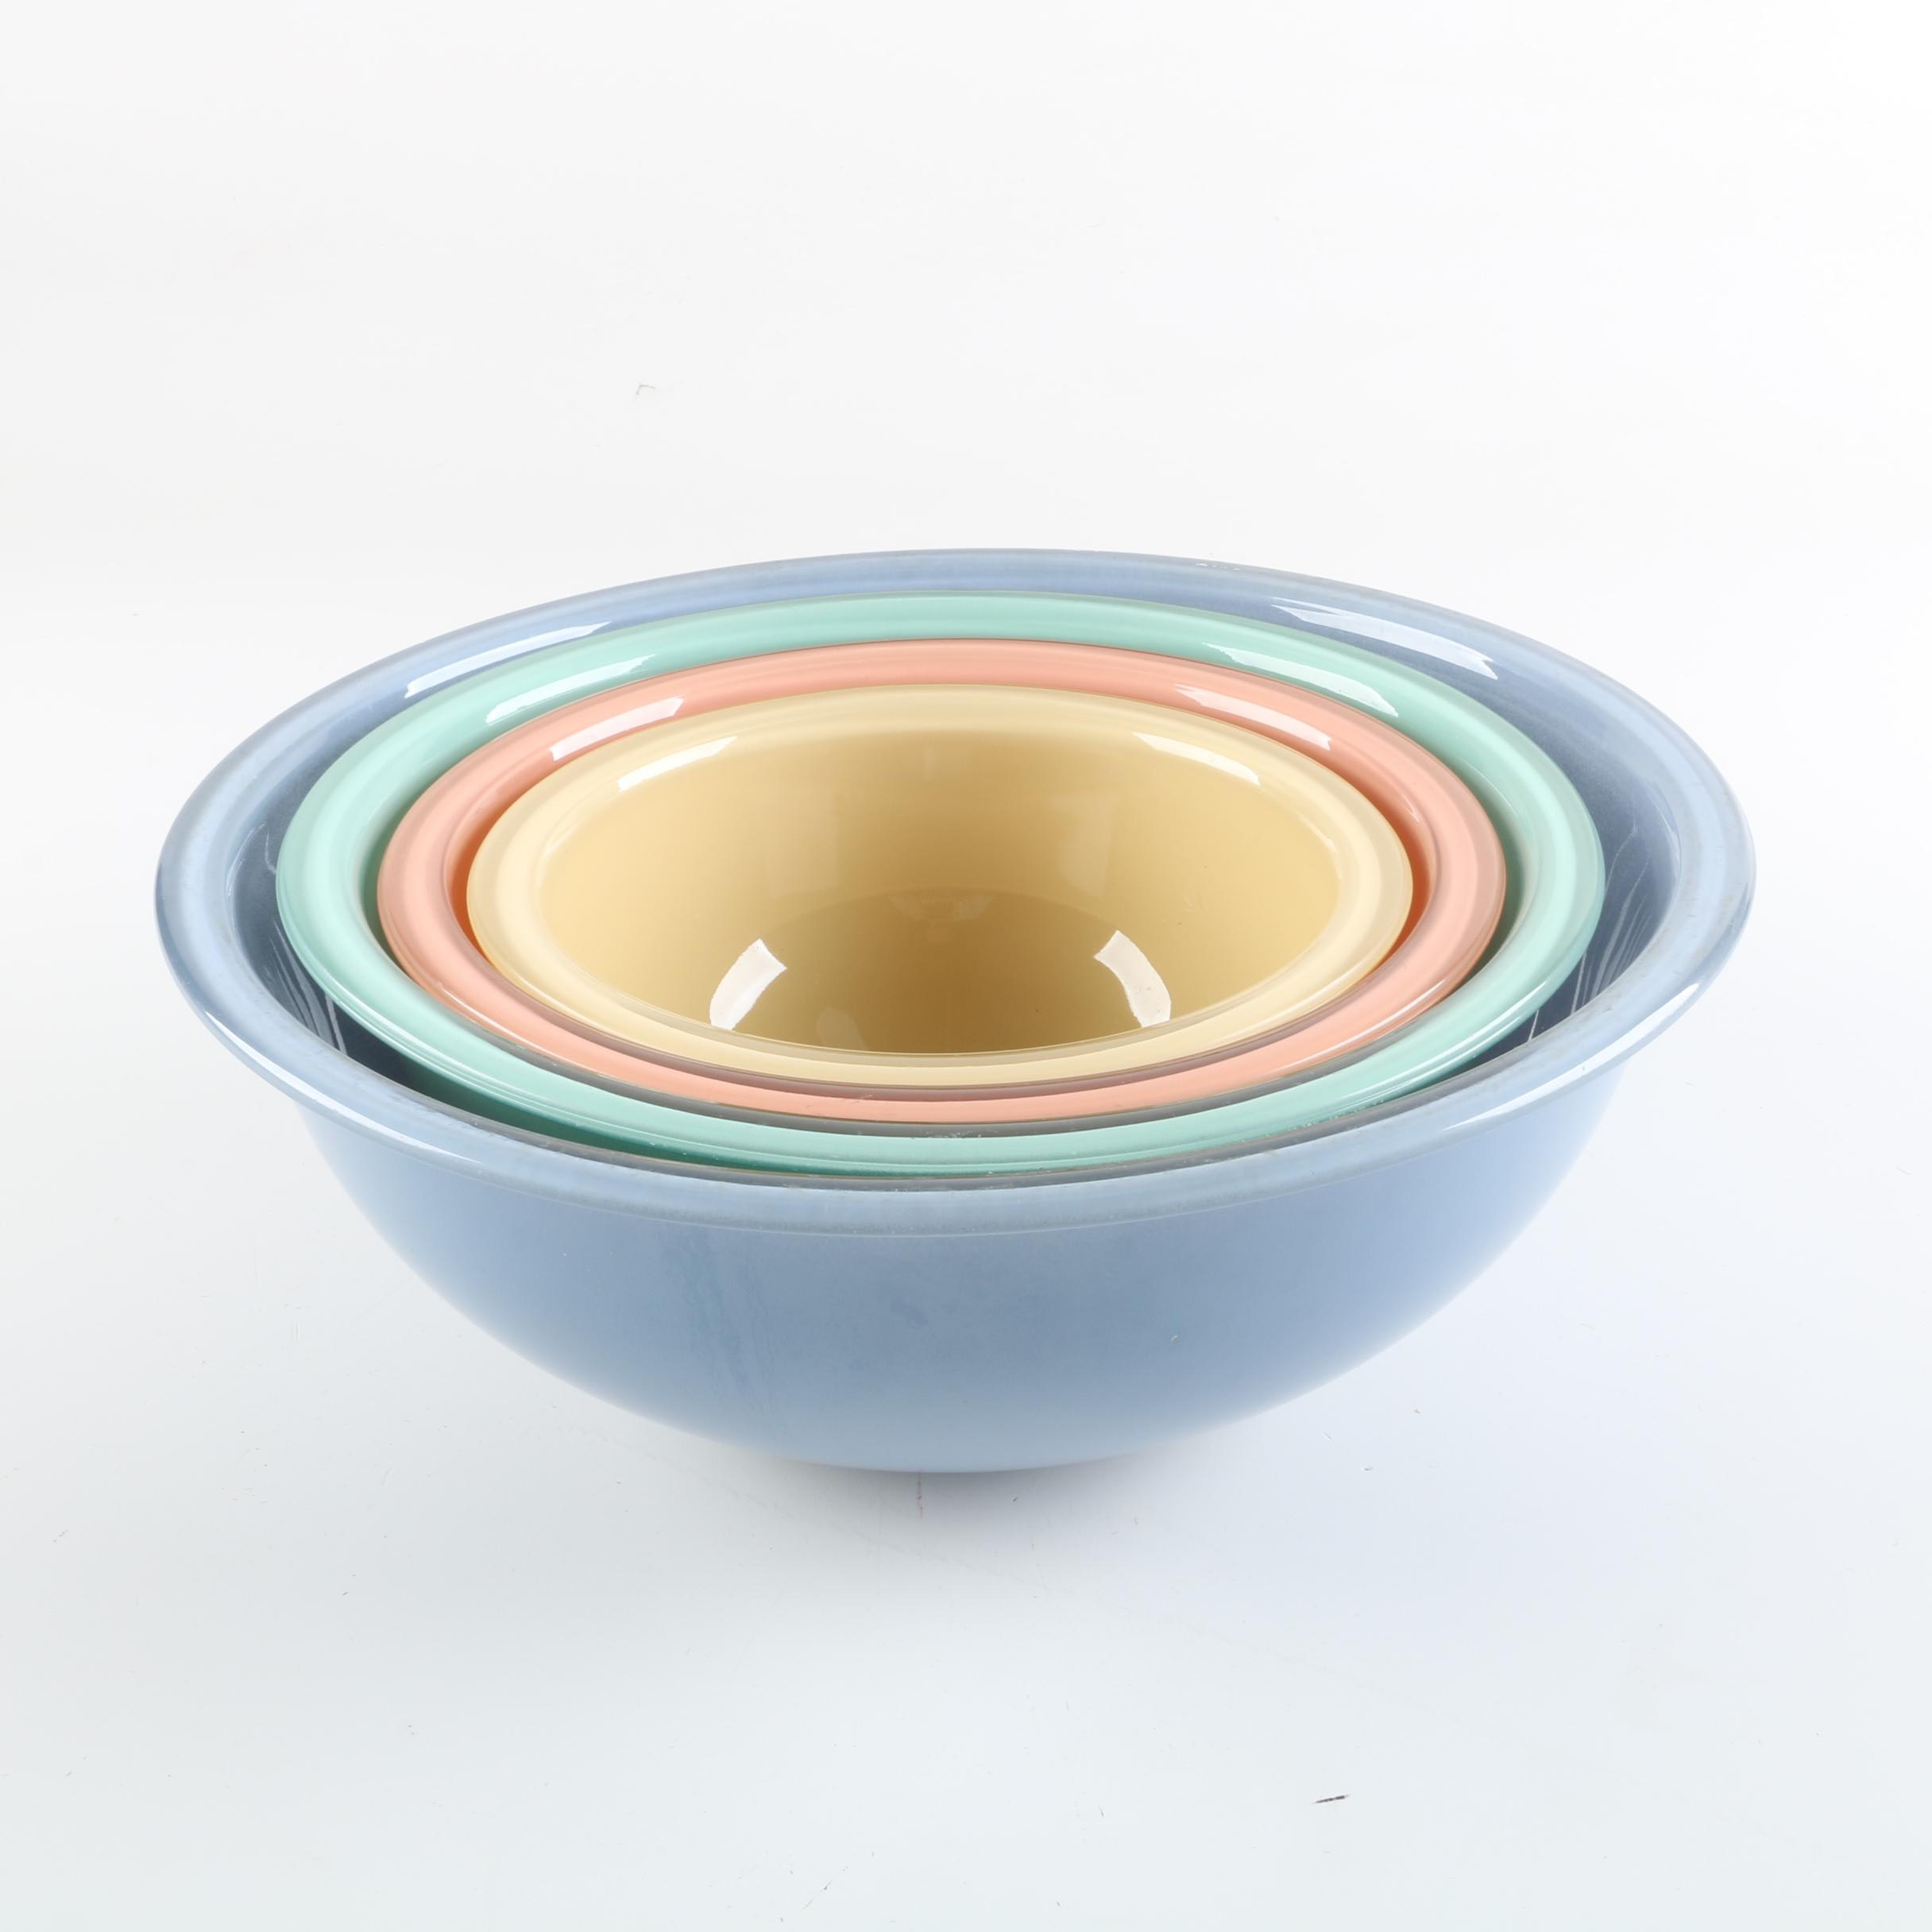 Vintage Pyrex Southwest Pastel Glass Nesting Bowls